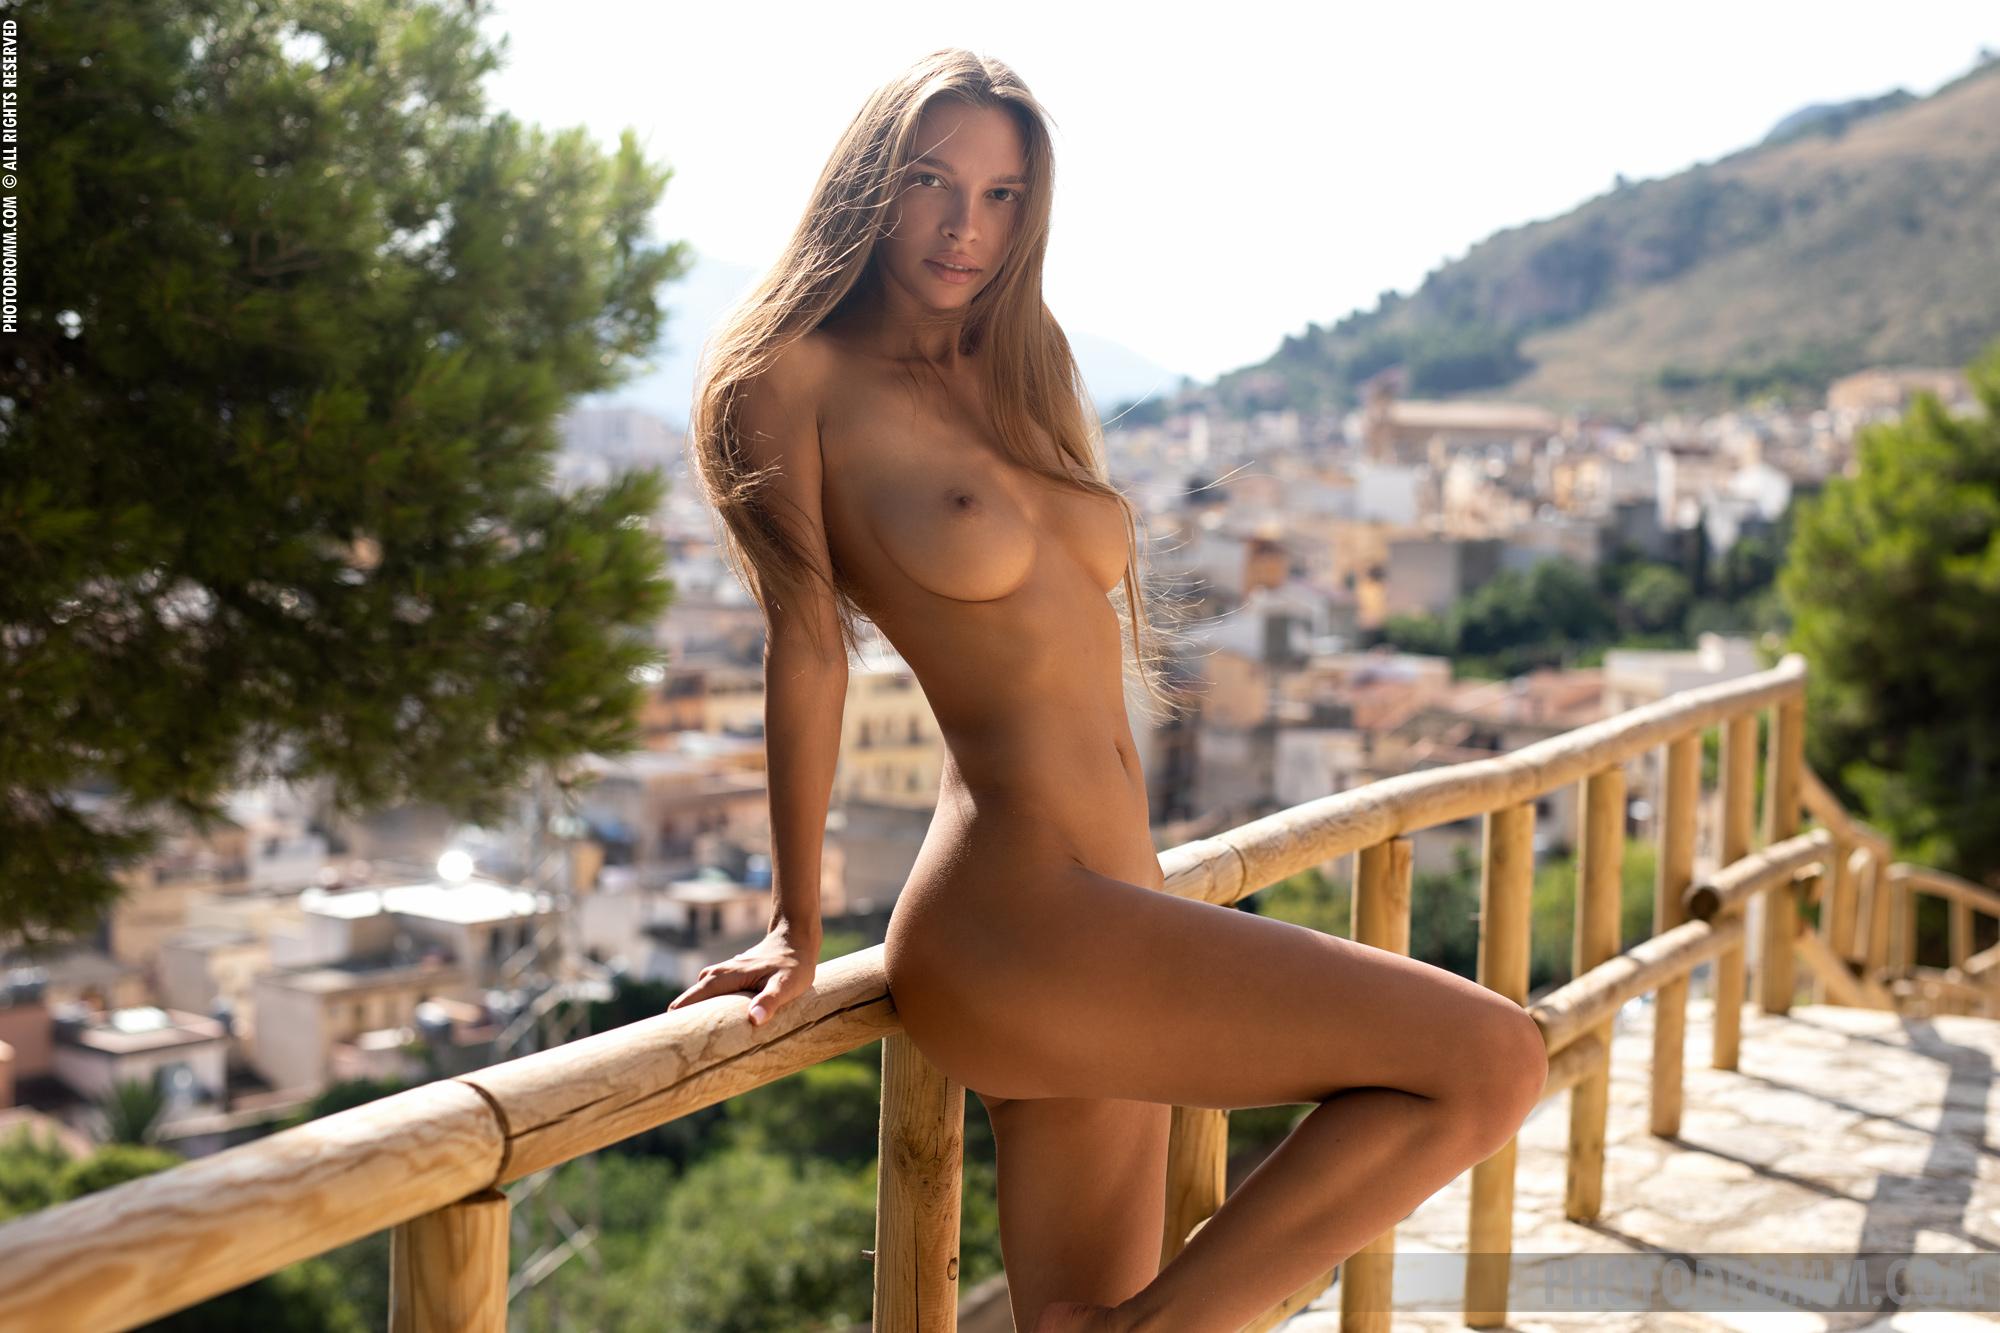 Gia ren nude